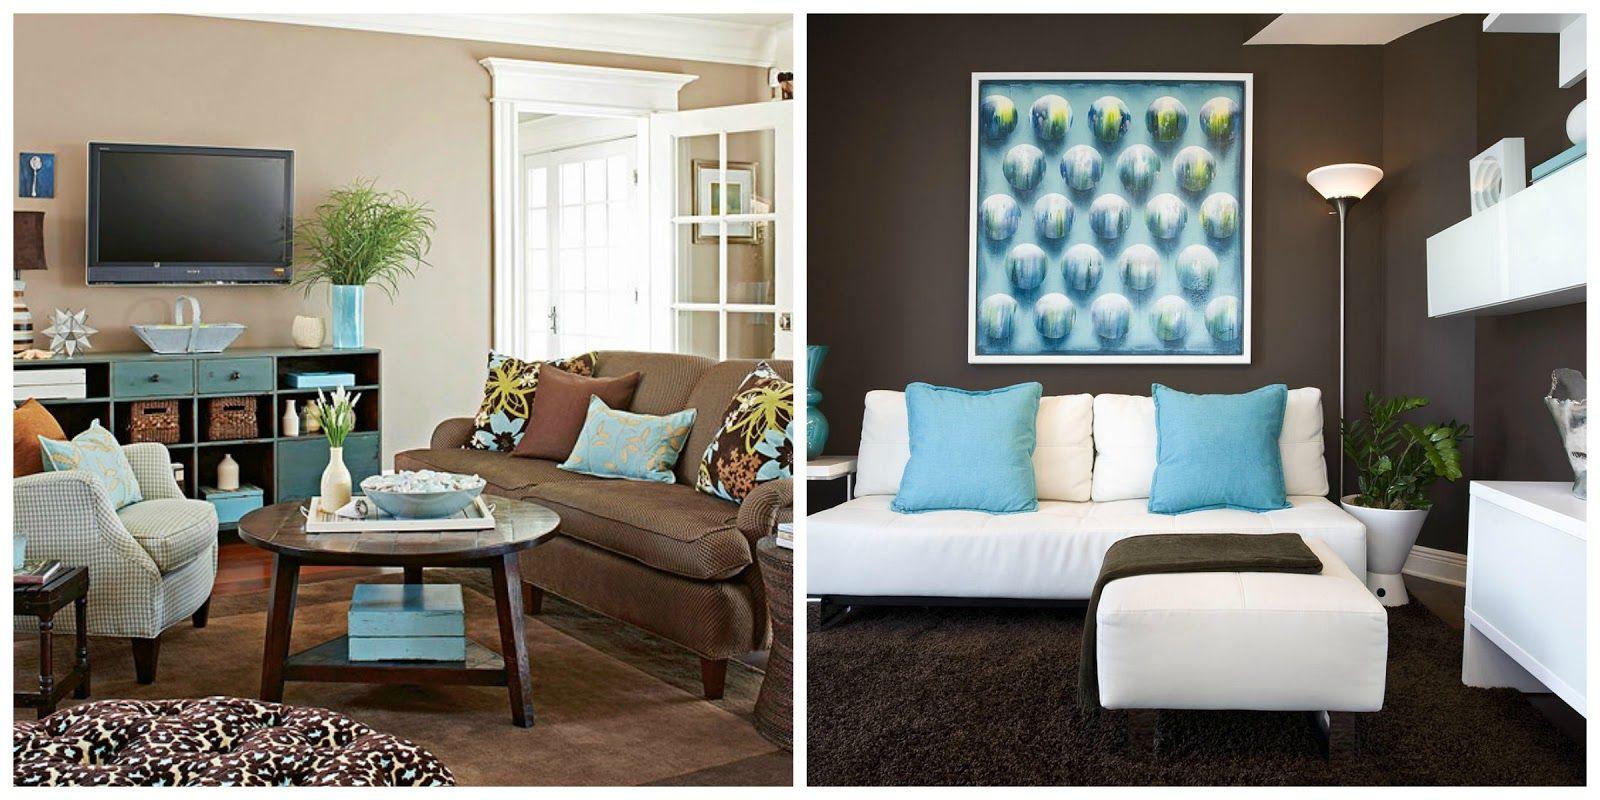 Marrom Para Sala De Estar ~ sala marrom e azul  Pesquisa Google  Sala de Estar  Pinterest